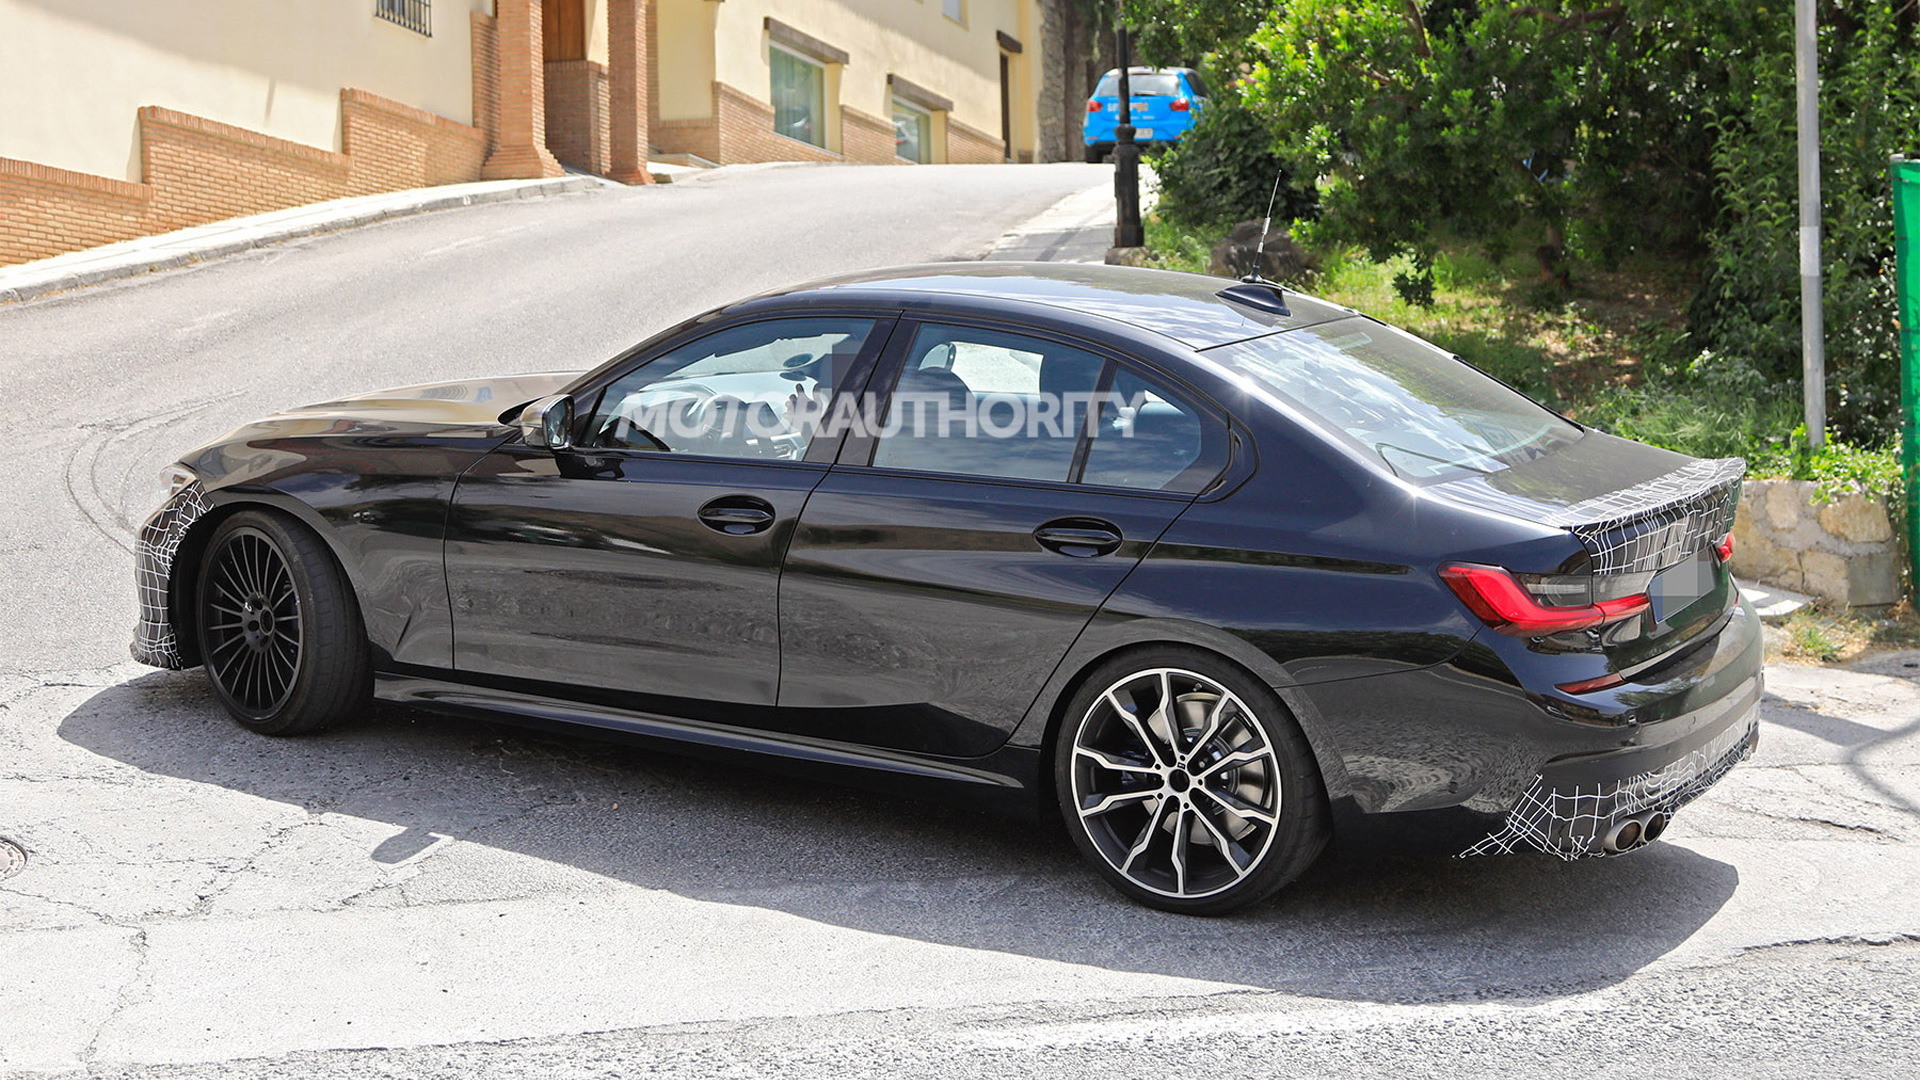 2020 BMW Alpina B3 Biturbo spy shots - Image via S. Baldauf/SB-Medien